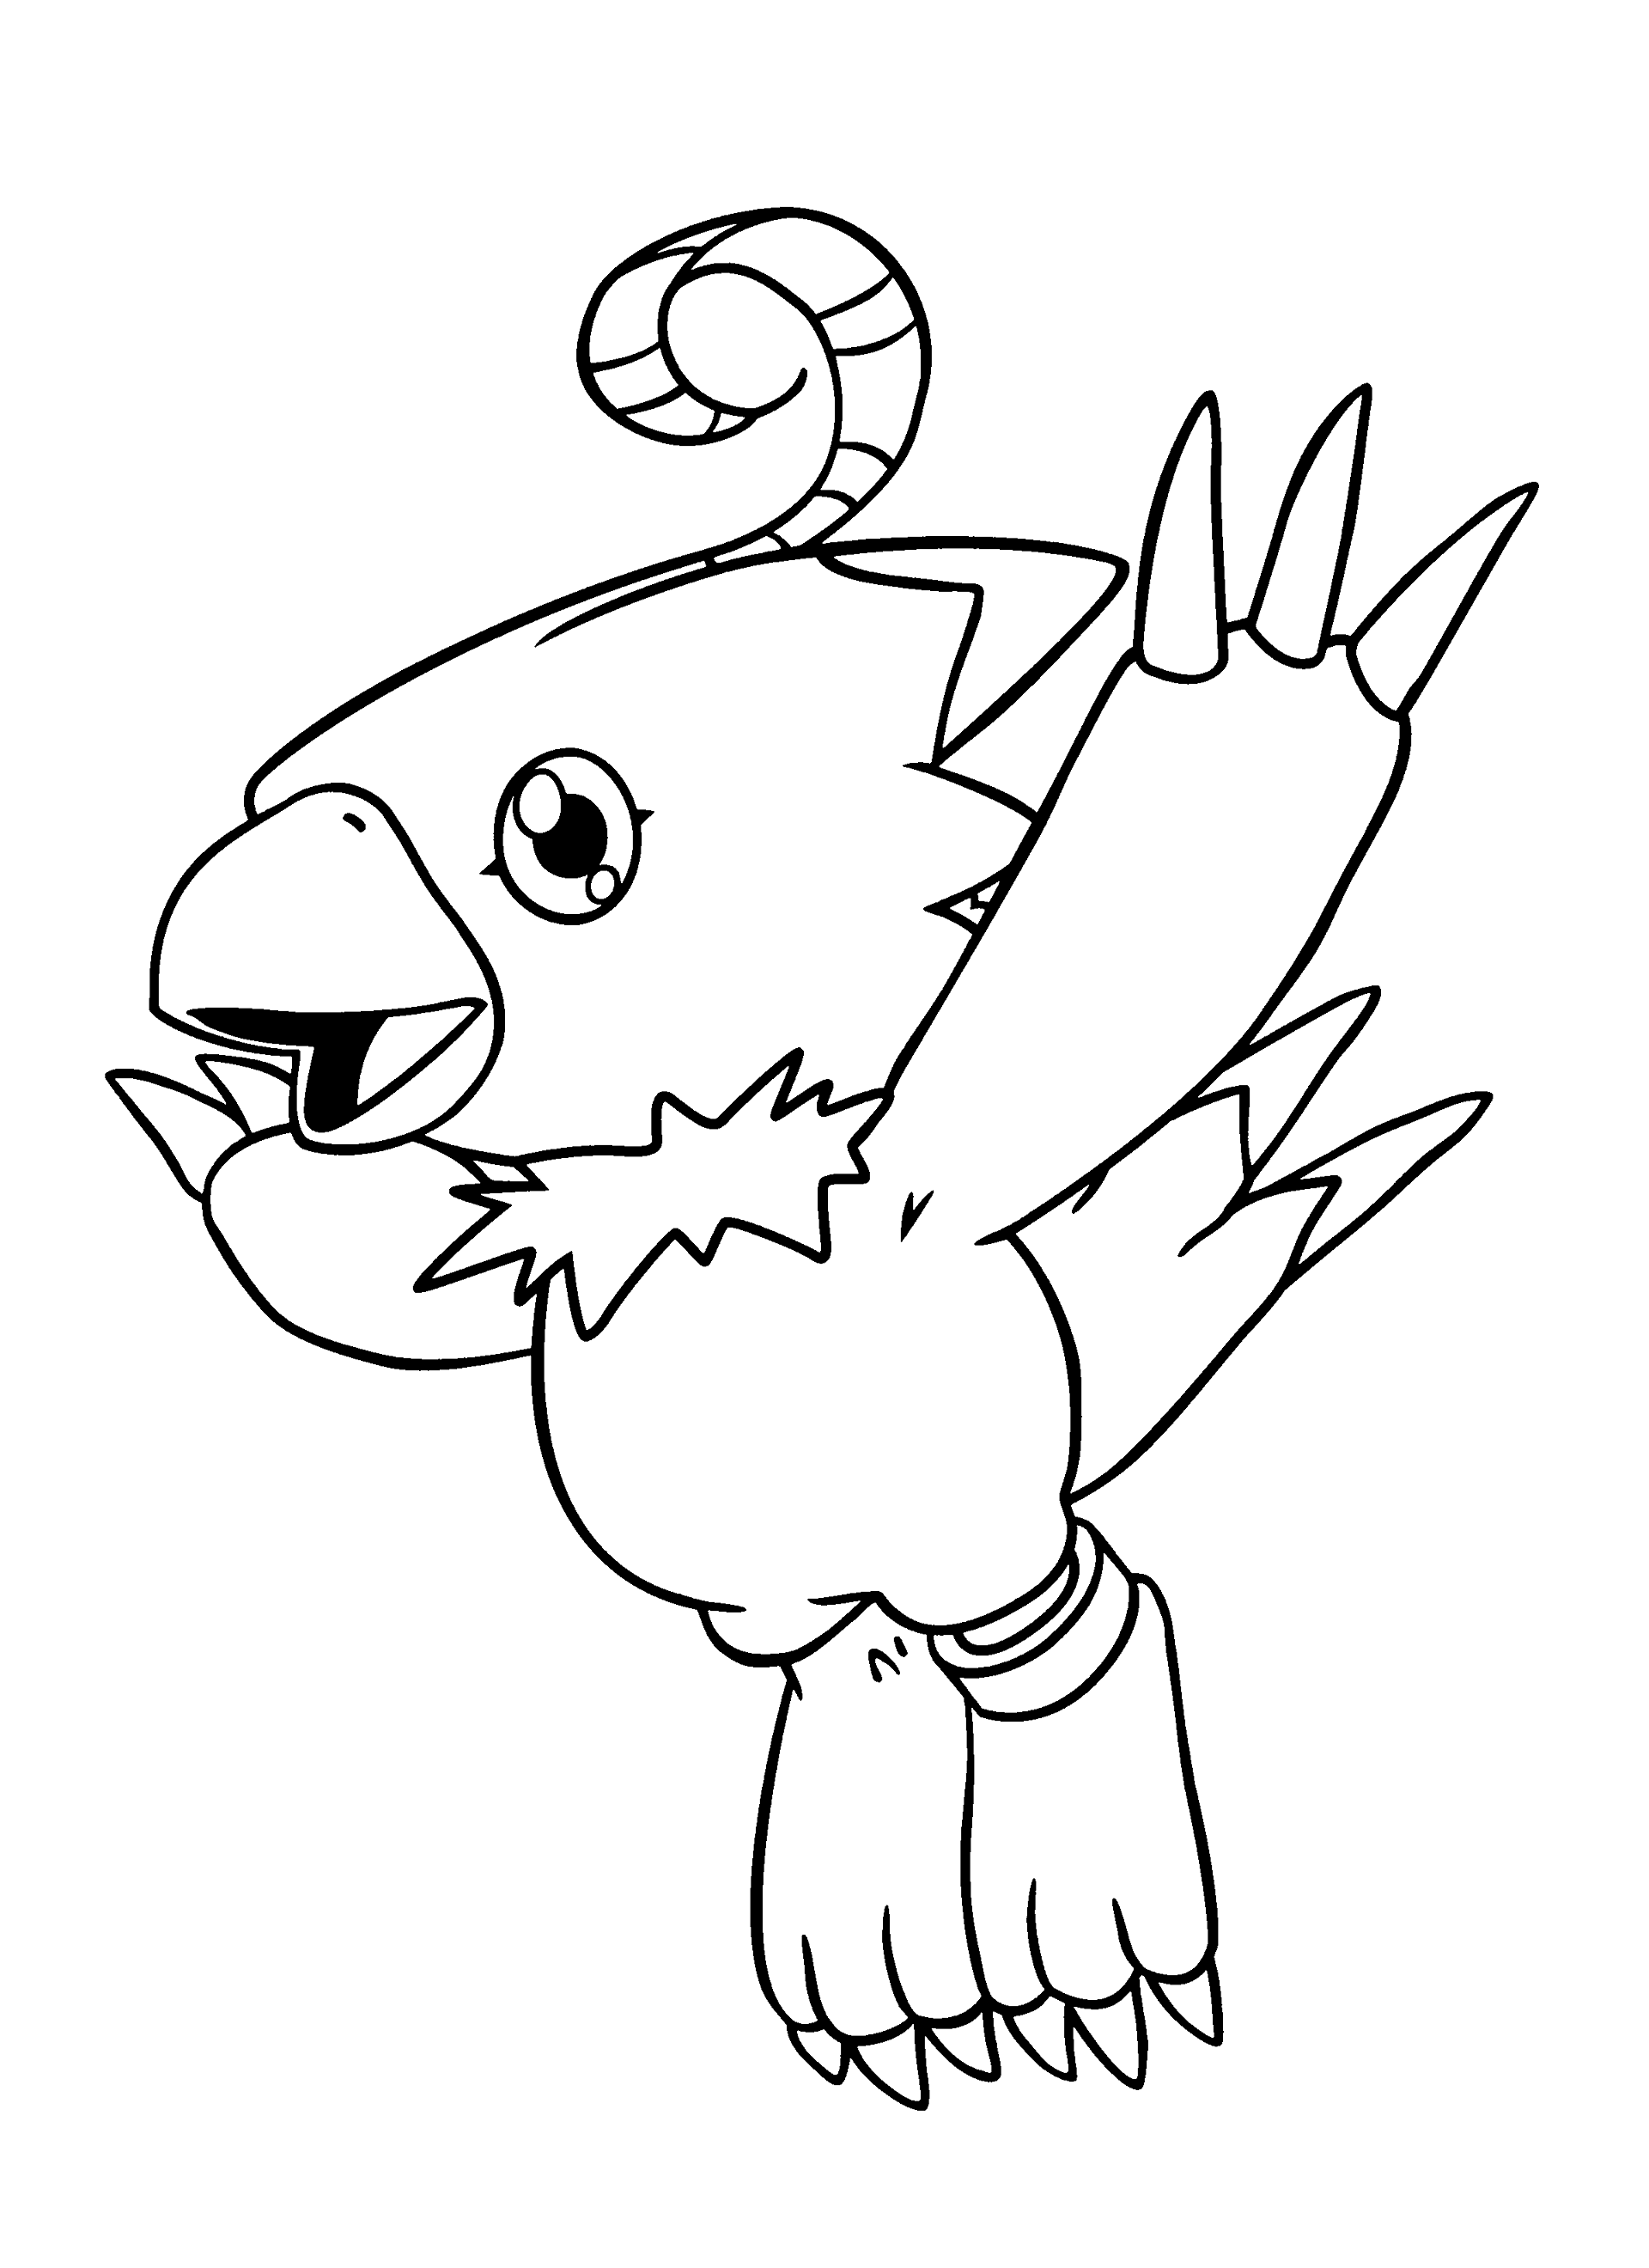 Dibujos de digimon para colorear pintar e imprimir gratis for Digimon coloring pages